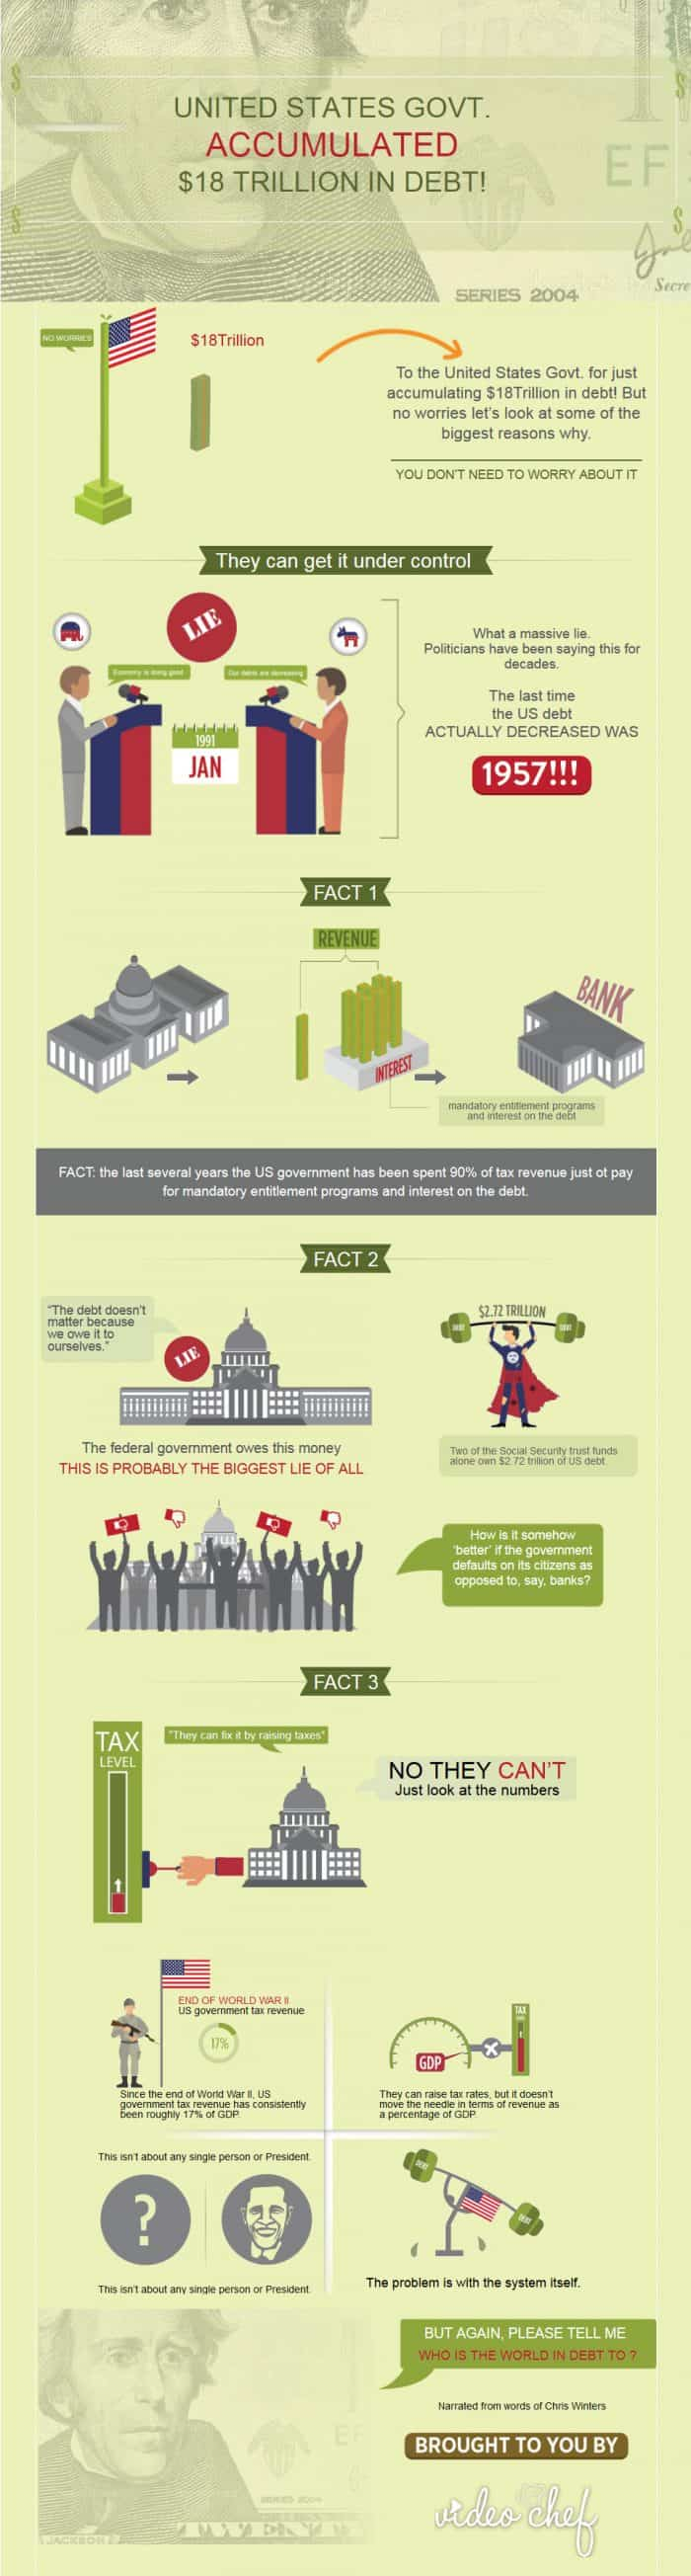 United States' $18 Trillion Debt Infographic